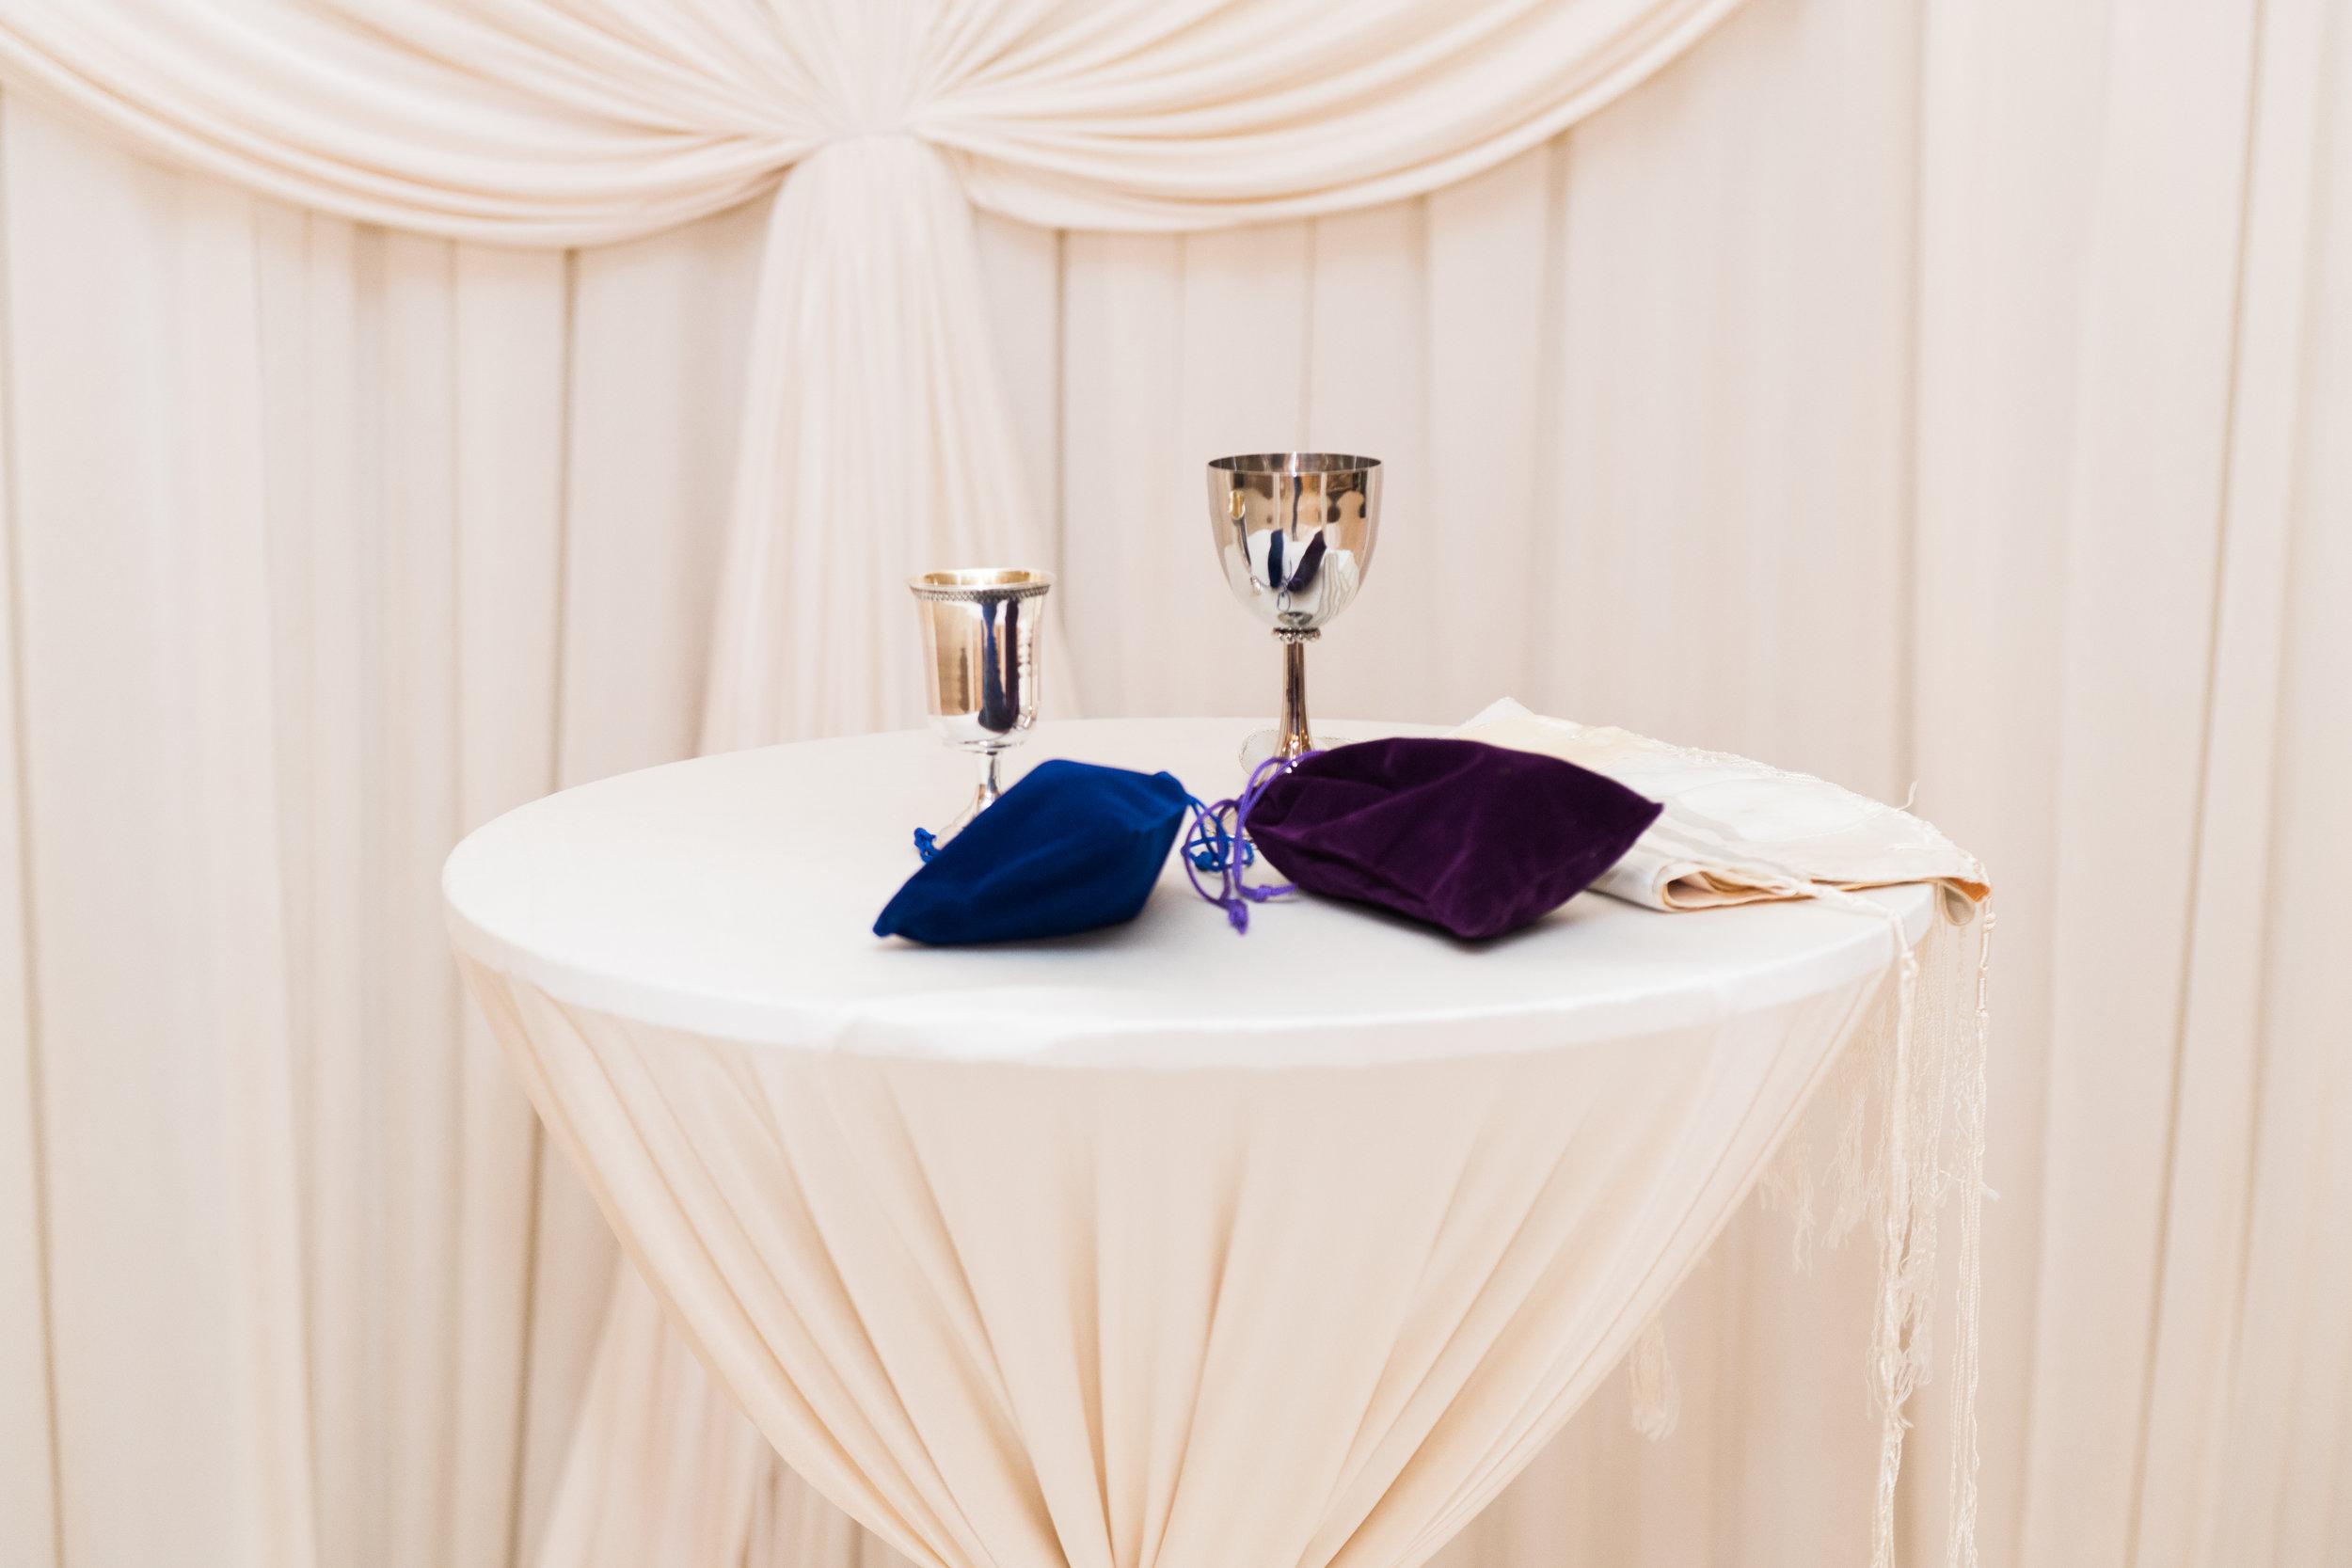 Bonphotage Evanston Wedding Photography - Hilton Orrington/Evanston